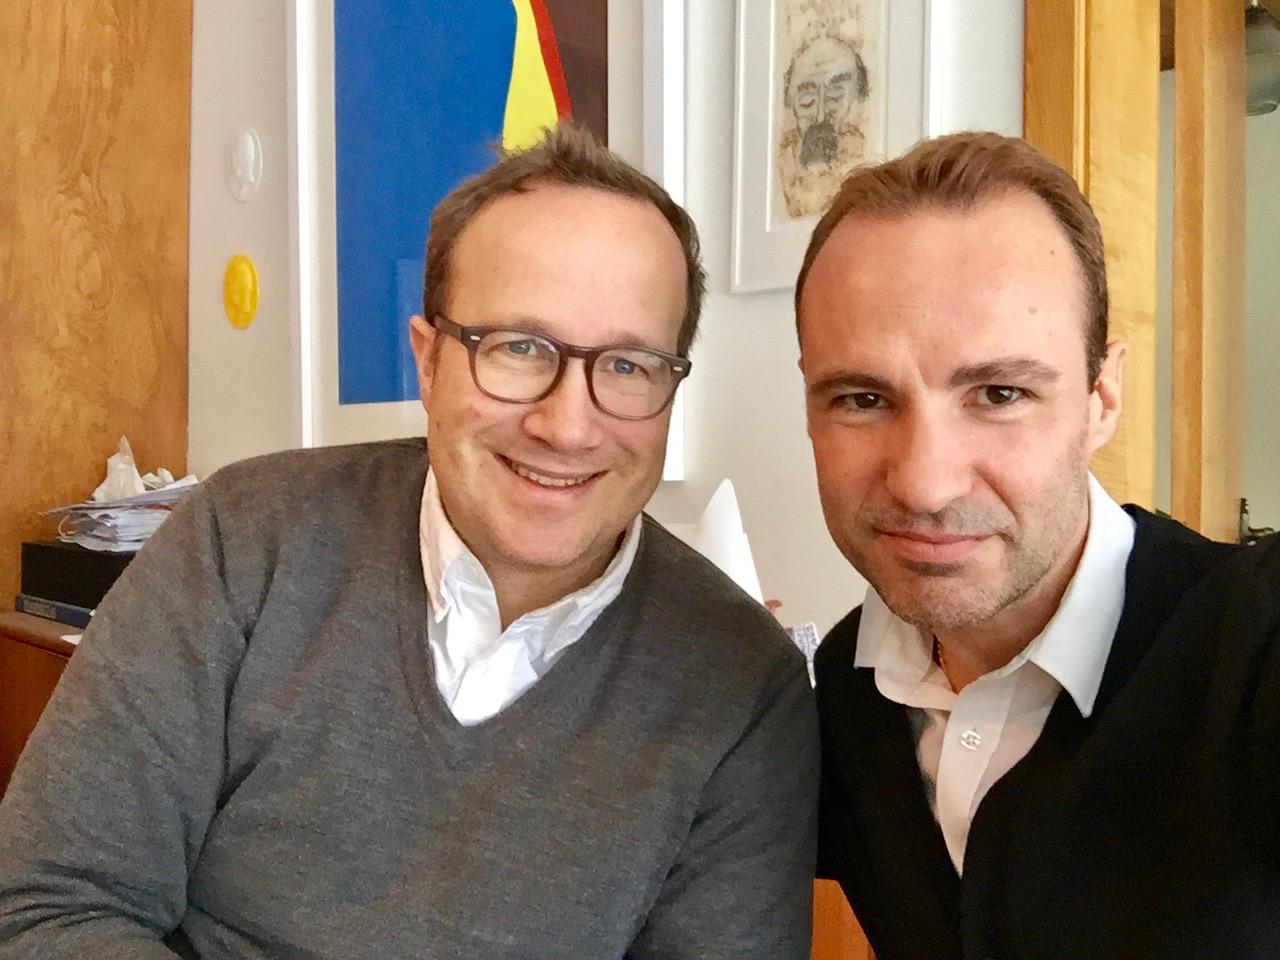 Andri Magnason interview English with Spanish author Jordi Pujola